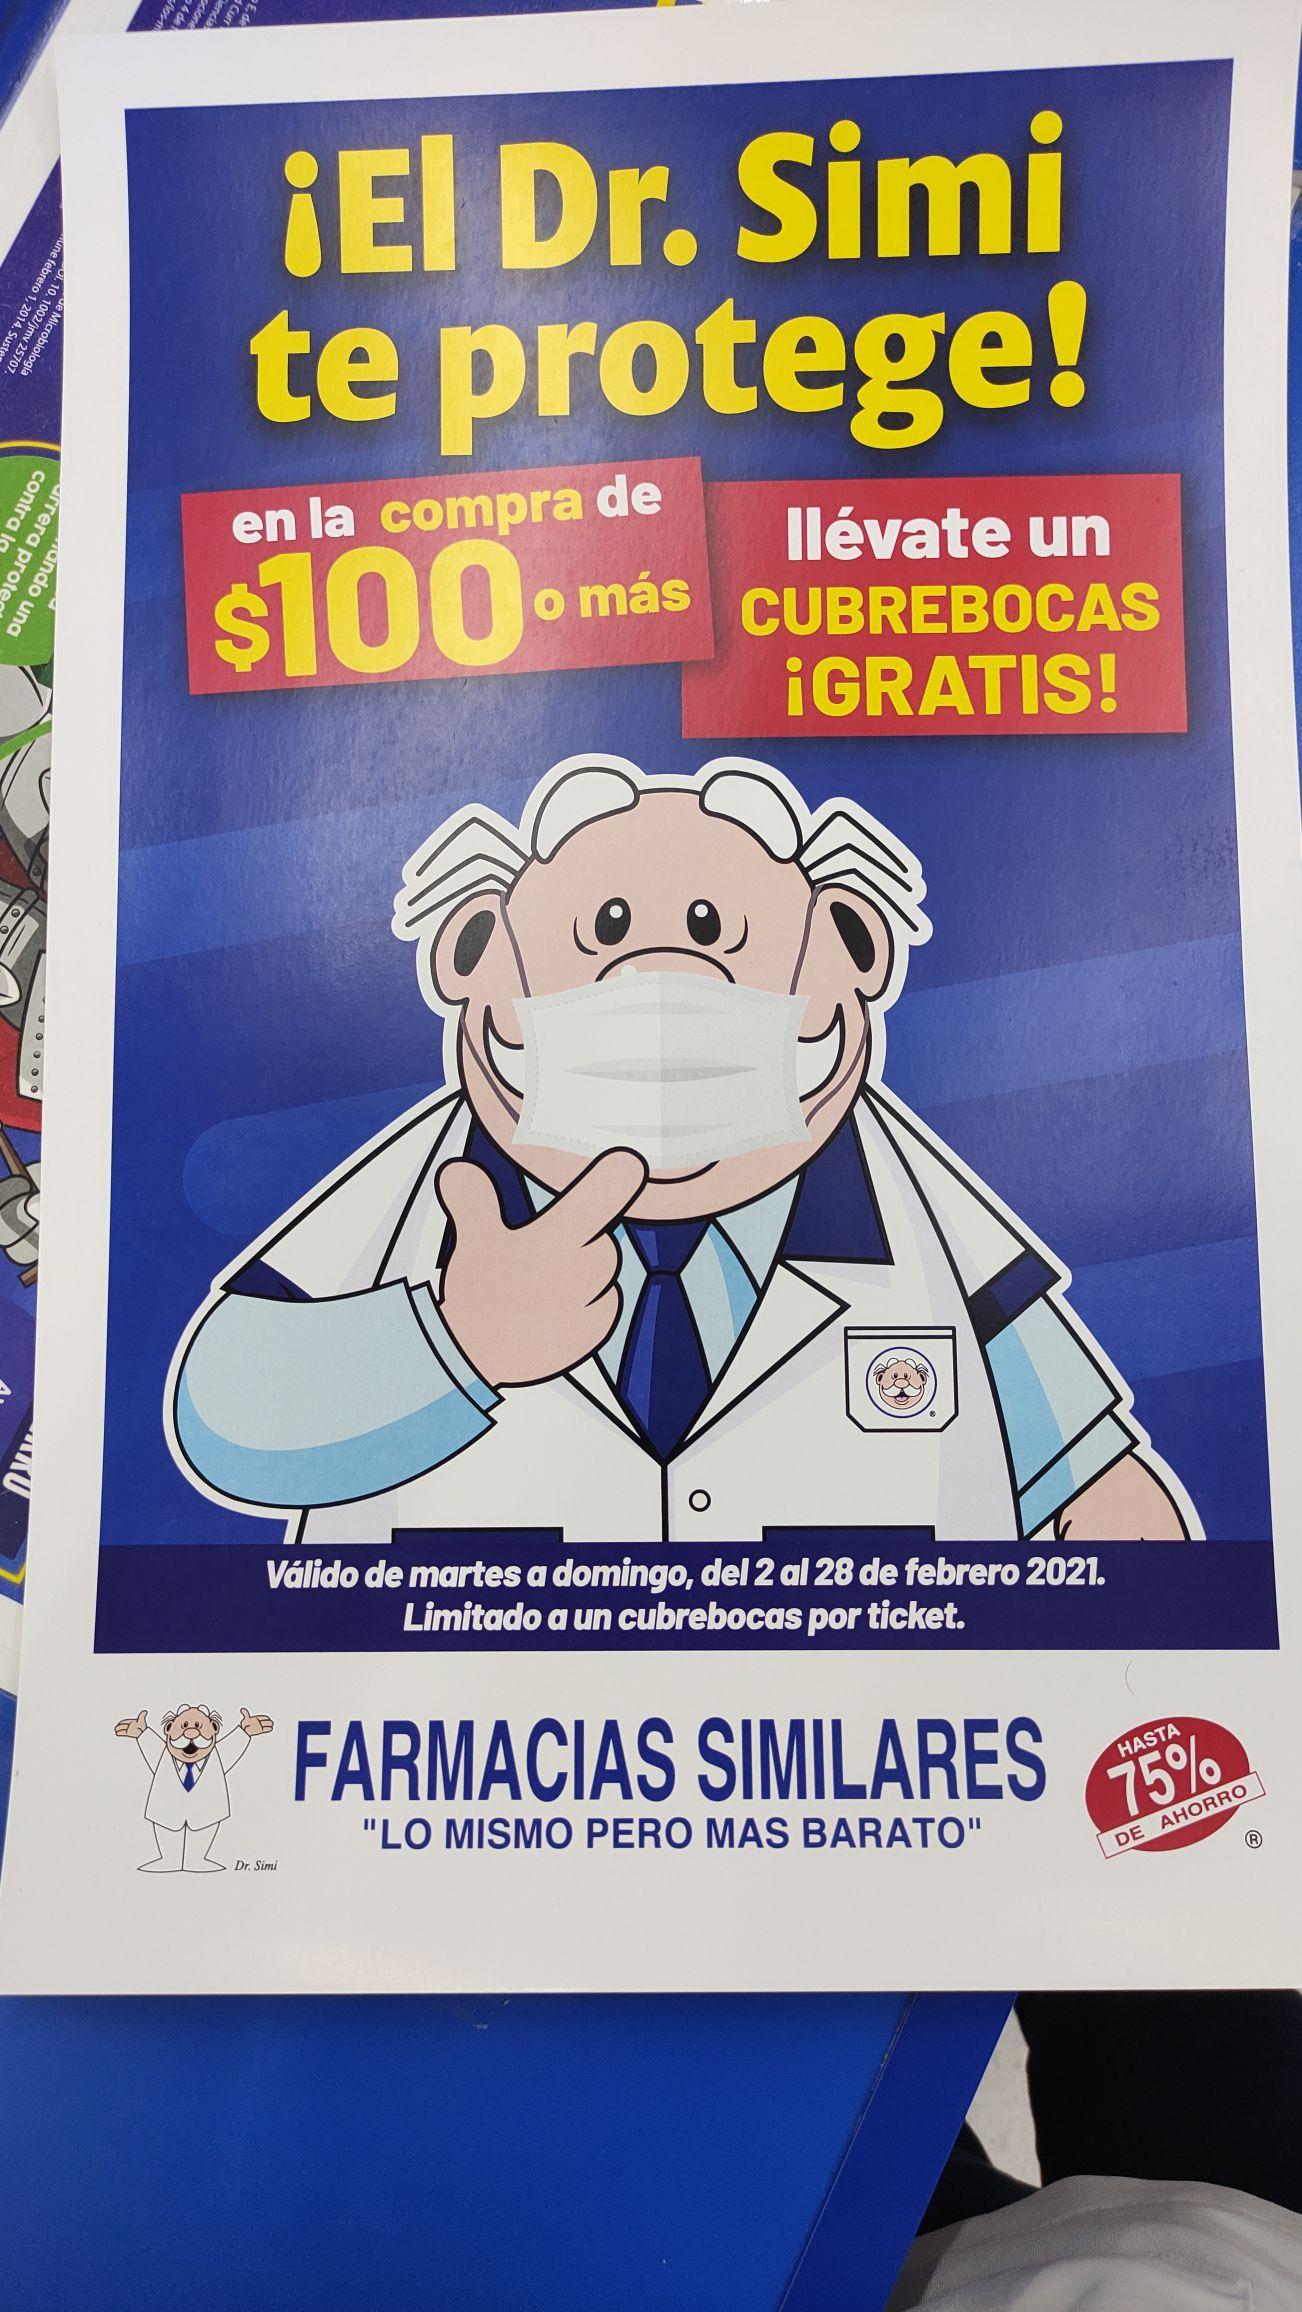 Farmacias Similares: Cubrebocas GRATIS por cada $100 de compra